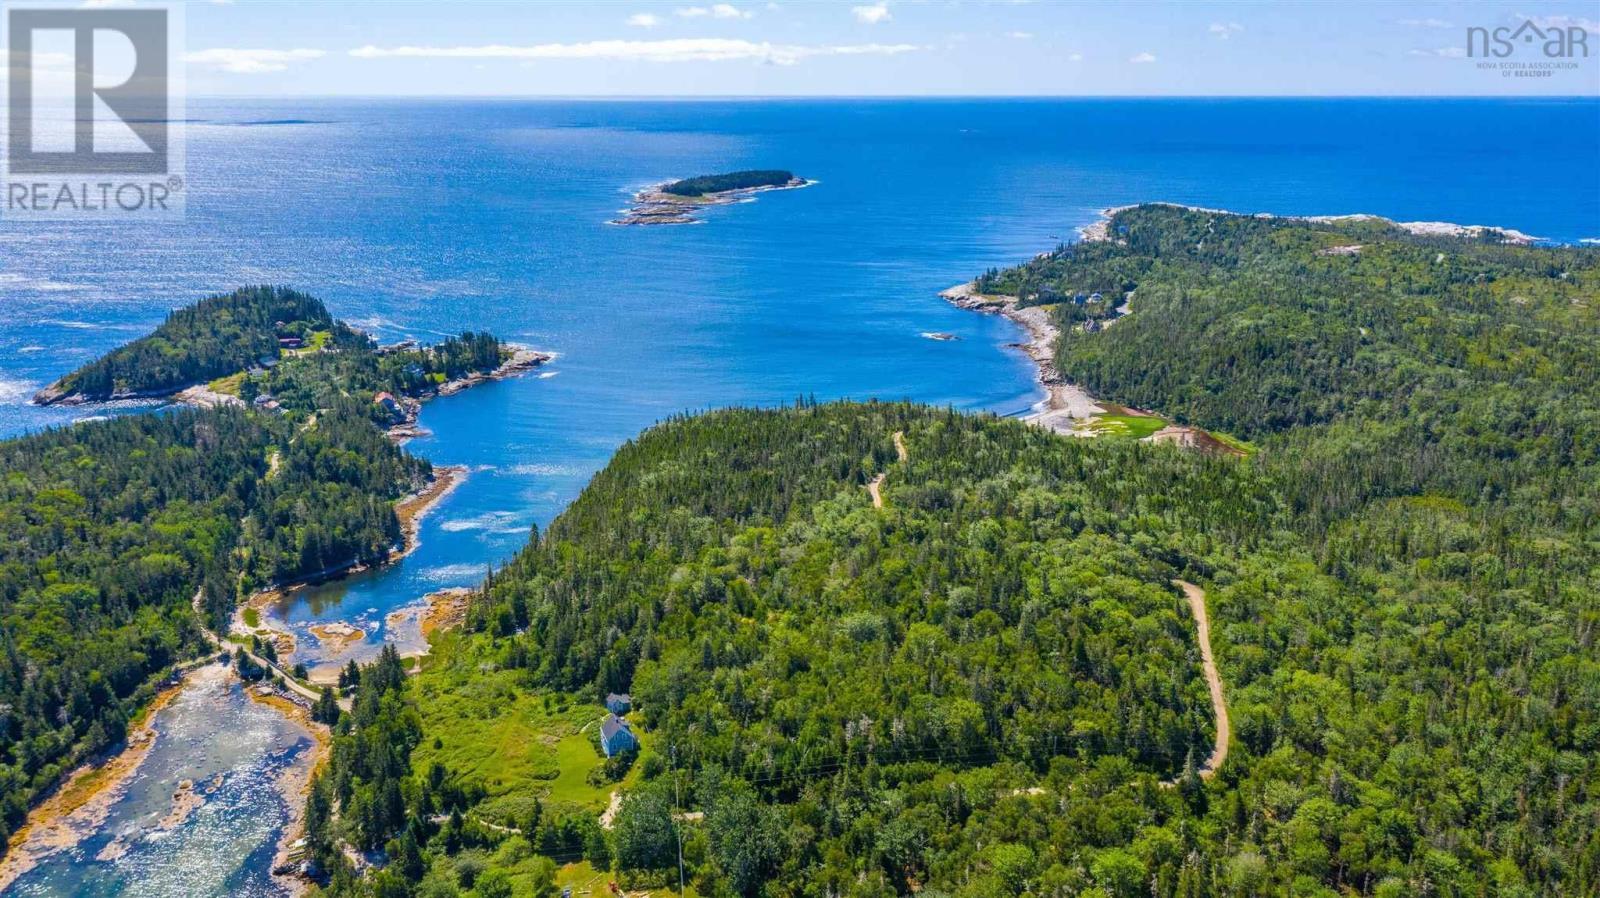 Lot W20-3 Owl's Head Drive, Southwest Cove, Nova Scotia  B0J 1T0 - Photo 11 - 202125696